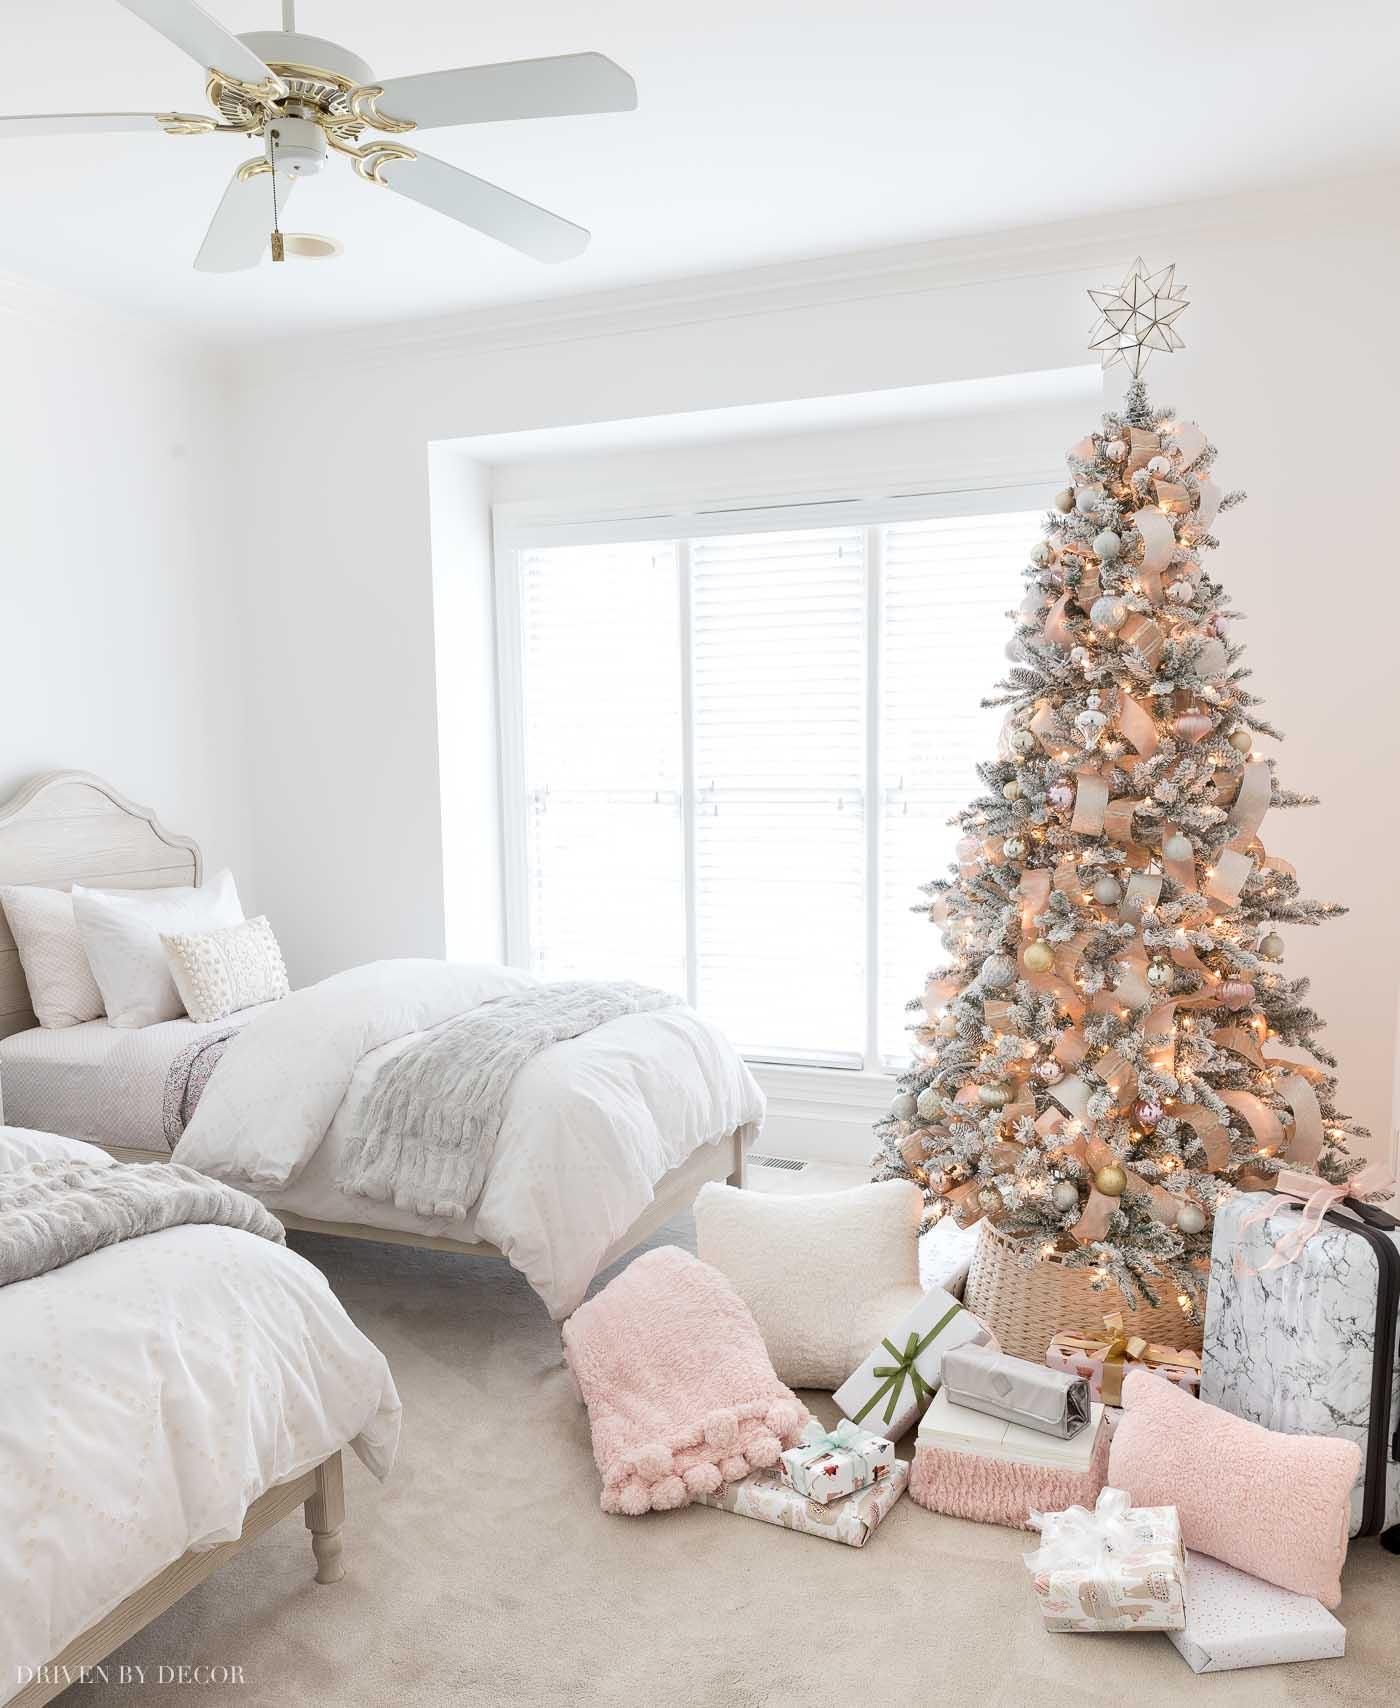 Christmas T Ideas For Teen Girls Six No Fail Presents